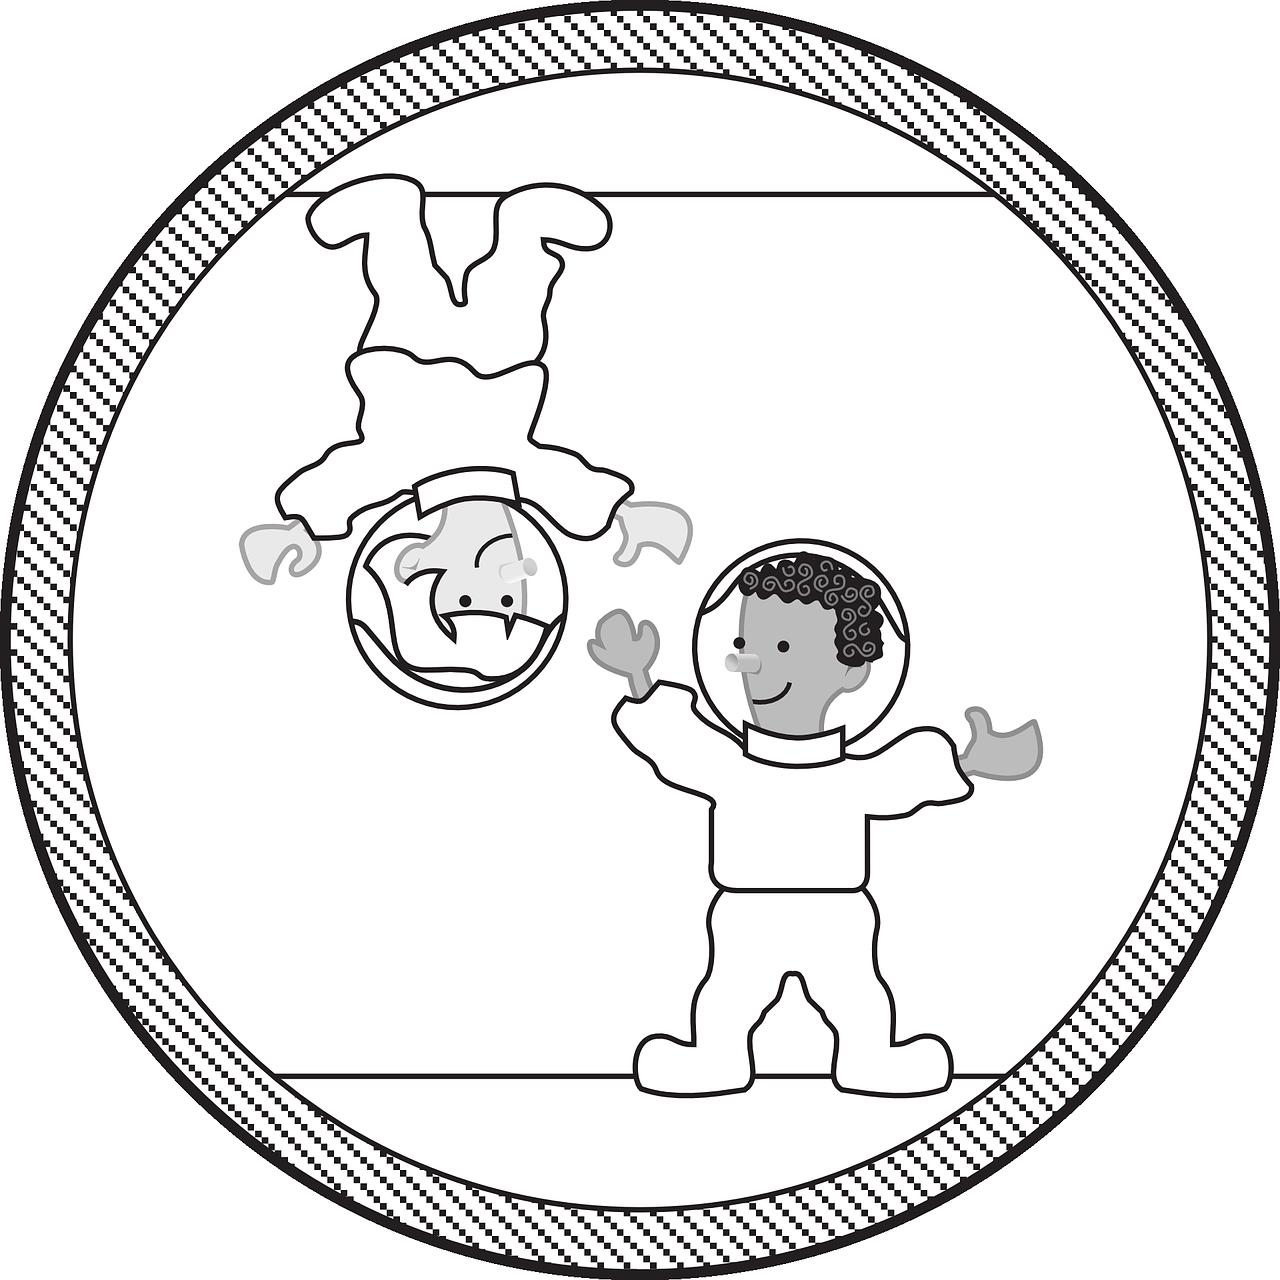 astronaut-148152_1280